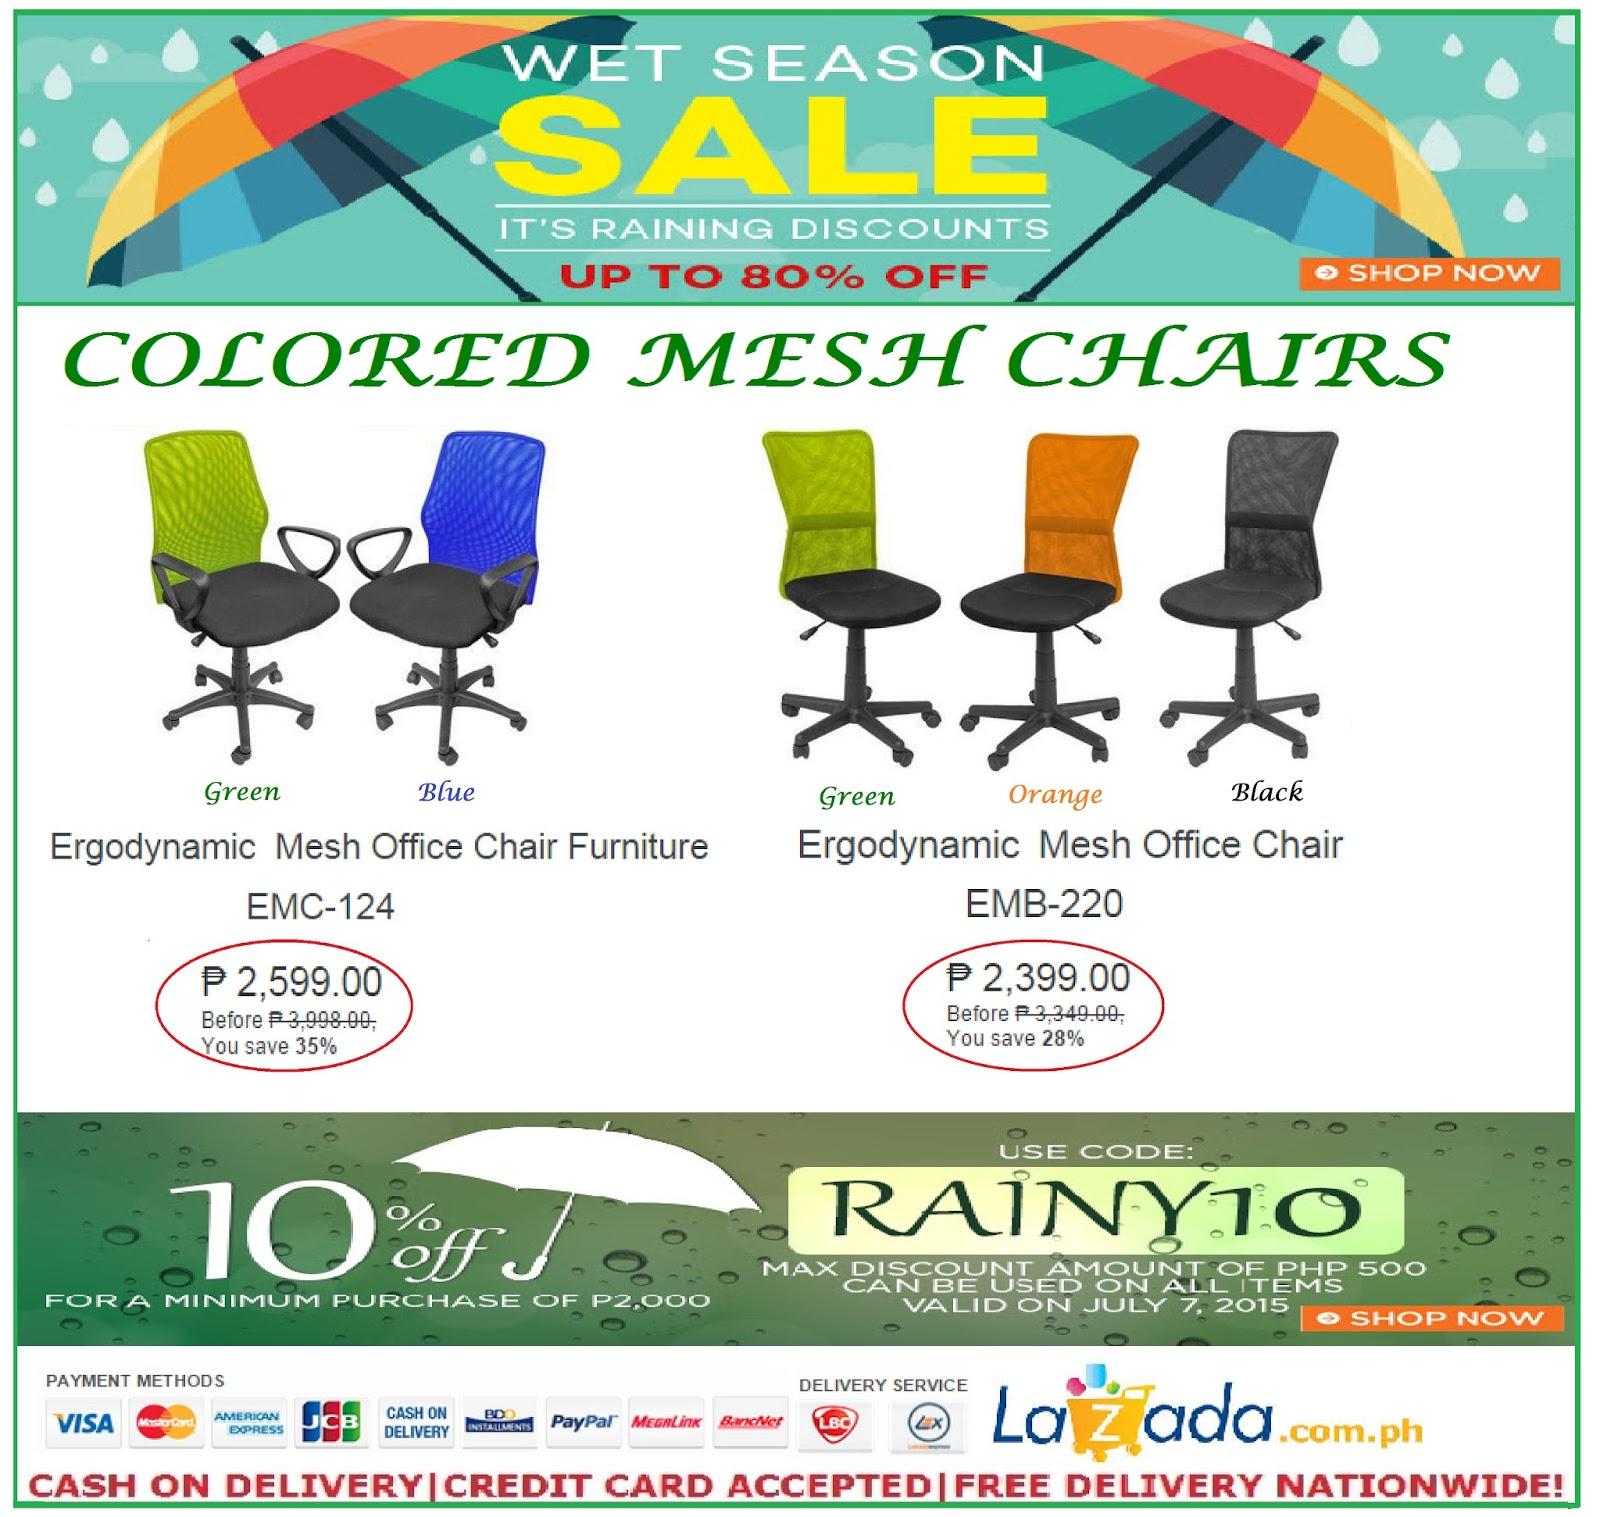 Office Furniture Office Chair Sale On Lazada Wet Season Promo